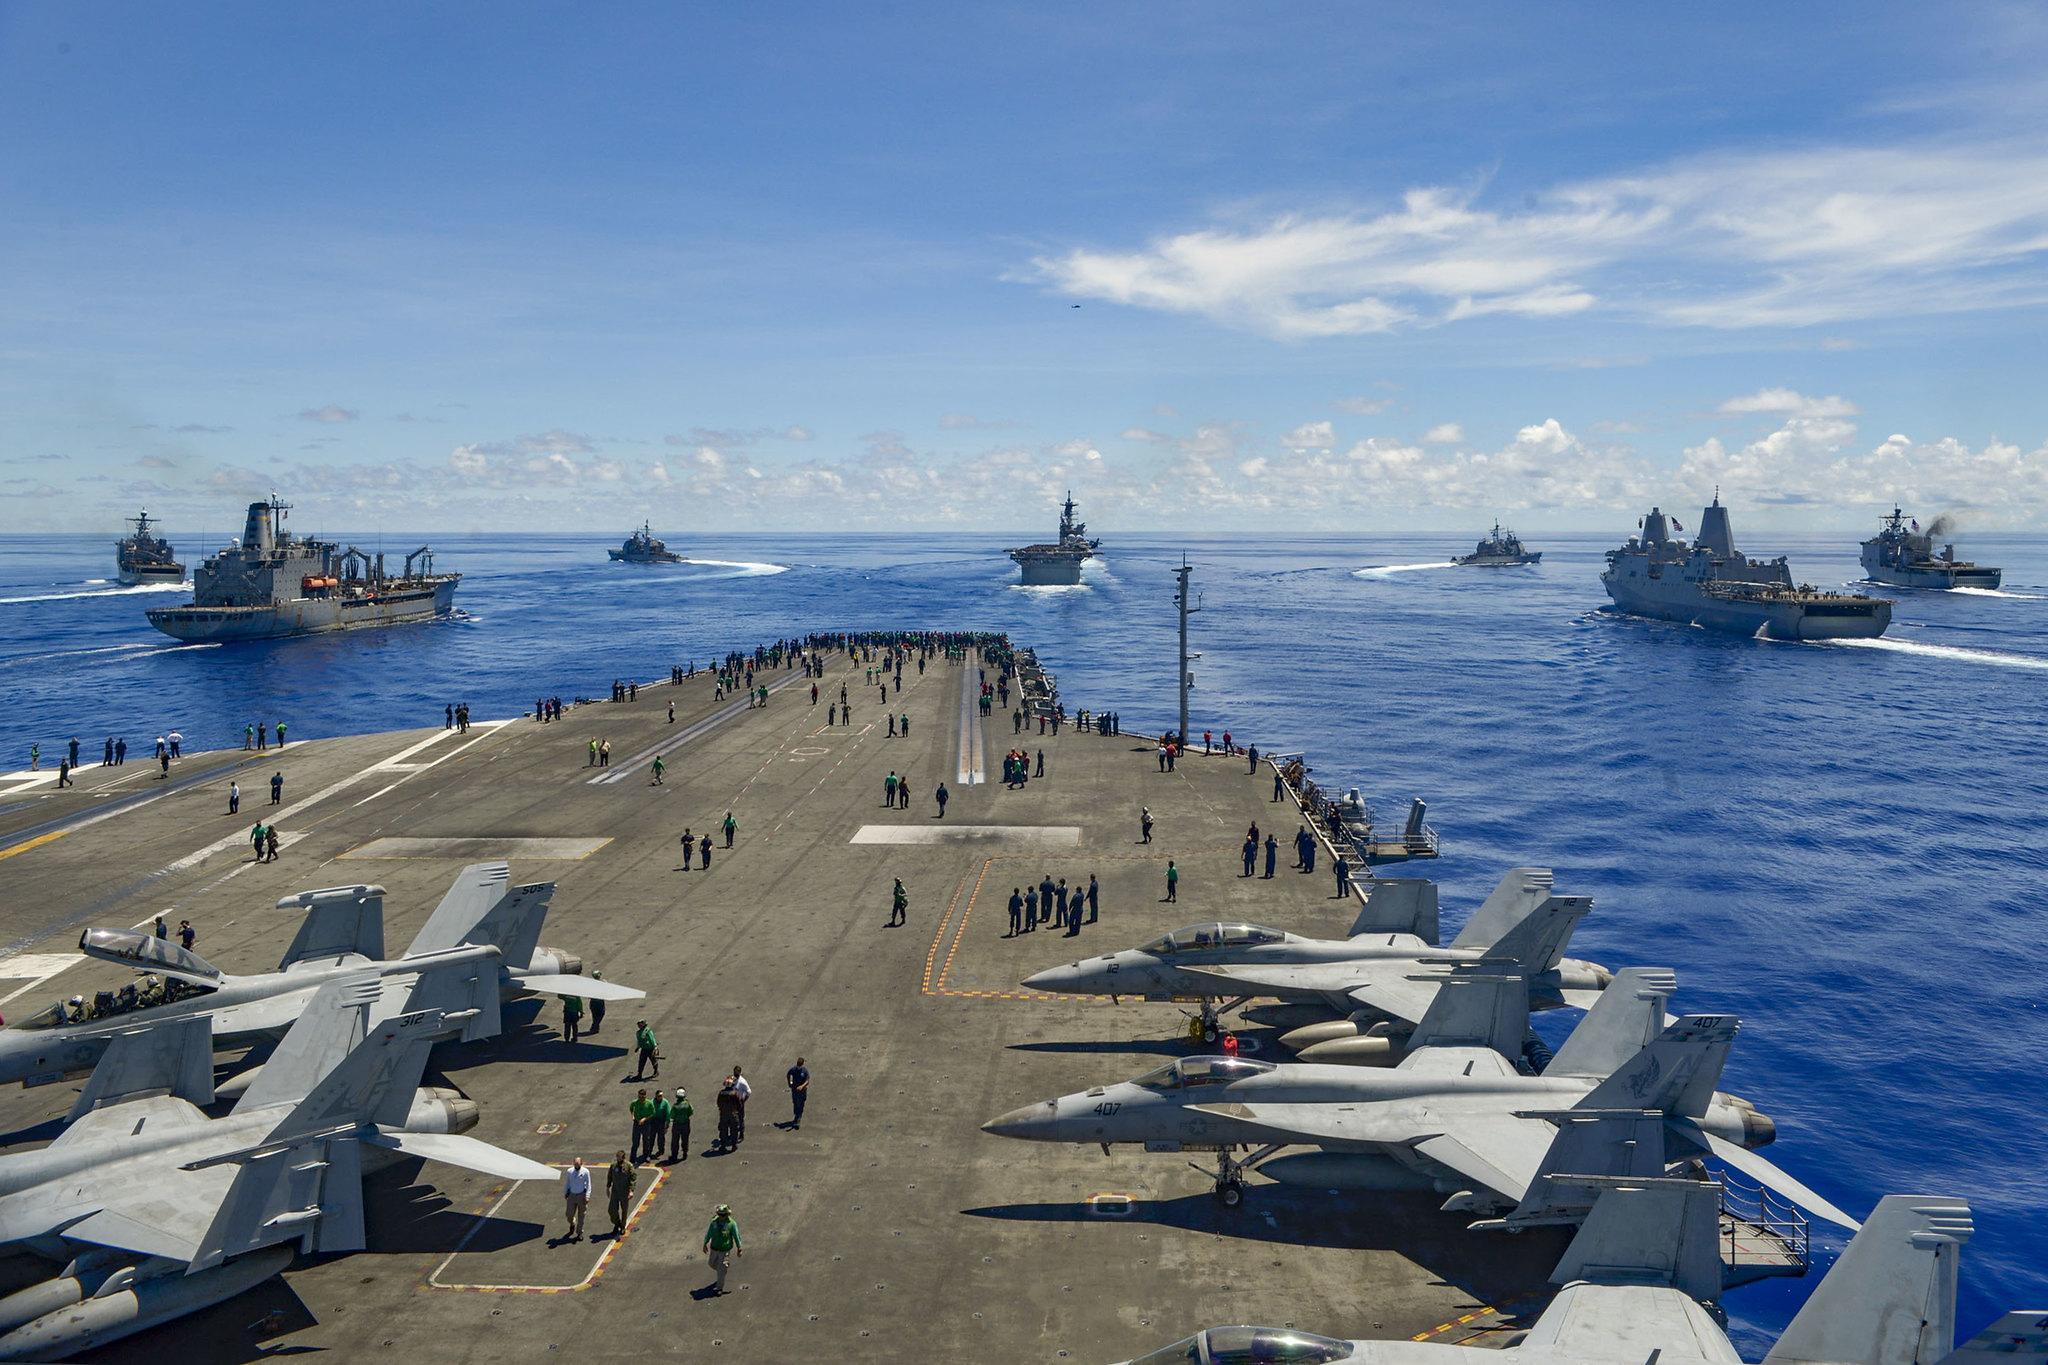 From left: USS Germantown (LSD 42), USNS John Ericsson (T-AO 194), USS Antietam (CG 54), USS Ronald Reagan (CVN 76), USS America (LHA 6), USS Shiloh (CG 67), USS New Orleans (LPD 18), and USS Comstock (LSD 45) break away from formation in support of Valiant Shield 2020 on Sept. 25, 2020, in the Philippine Sea. (Mass Communication Specialist Seaman Apprentice Oswald Felix Jr./Navy)